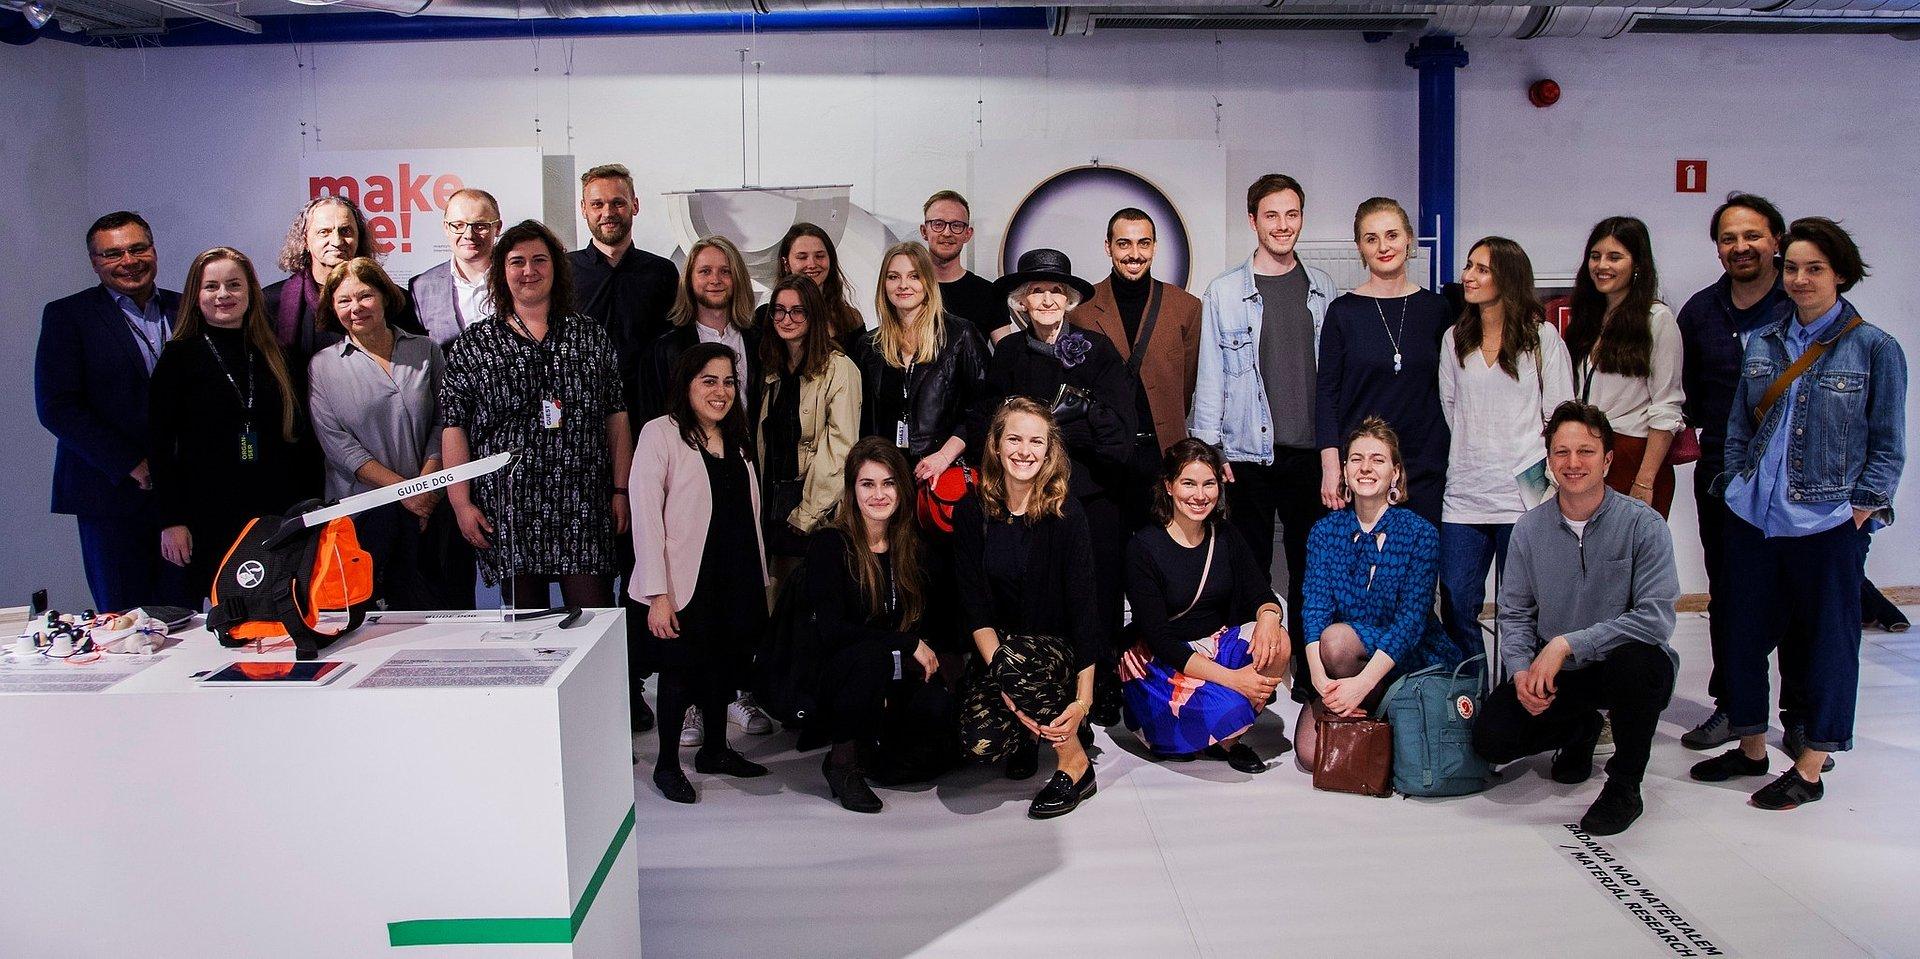 Ruszyła 13. edycja Łódź Design Festival